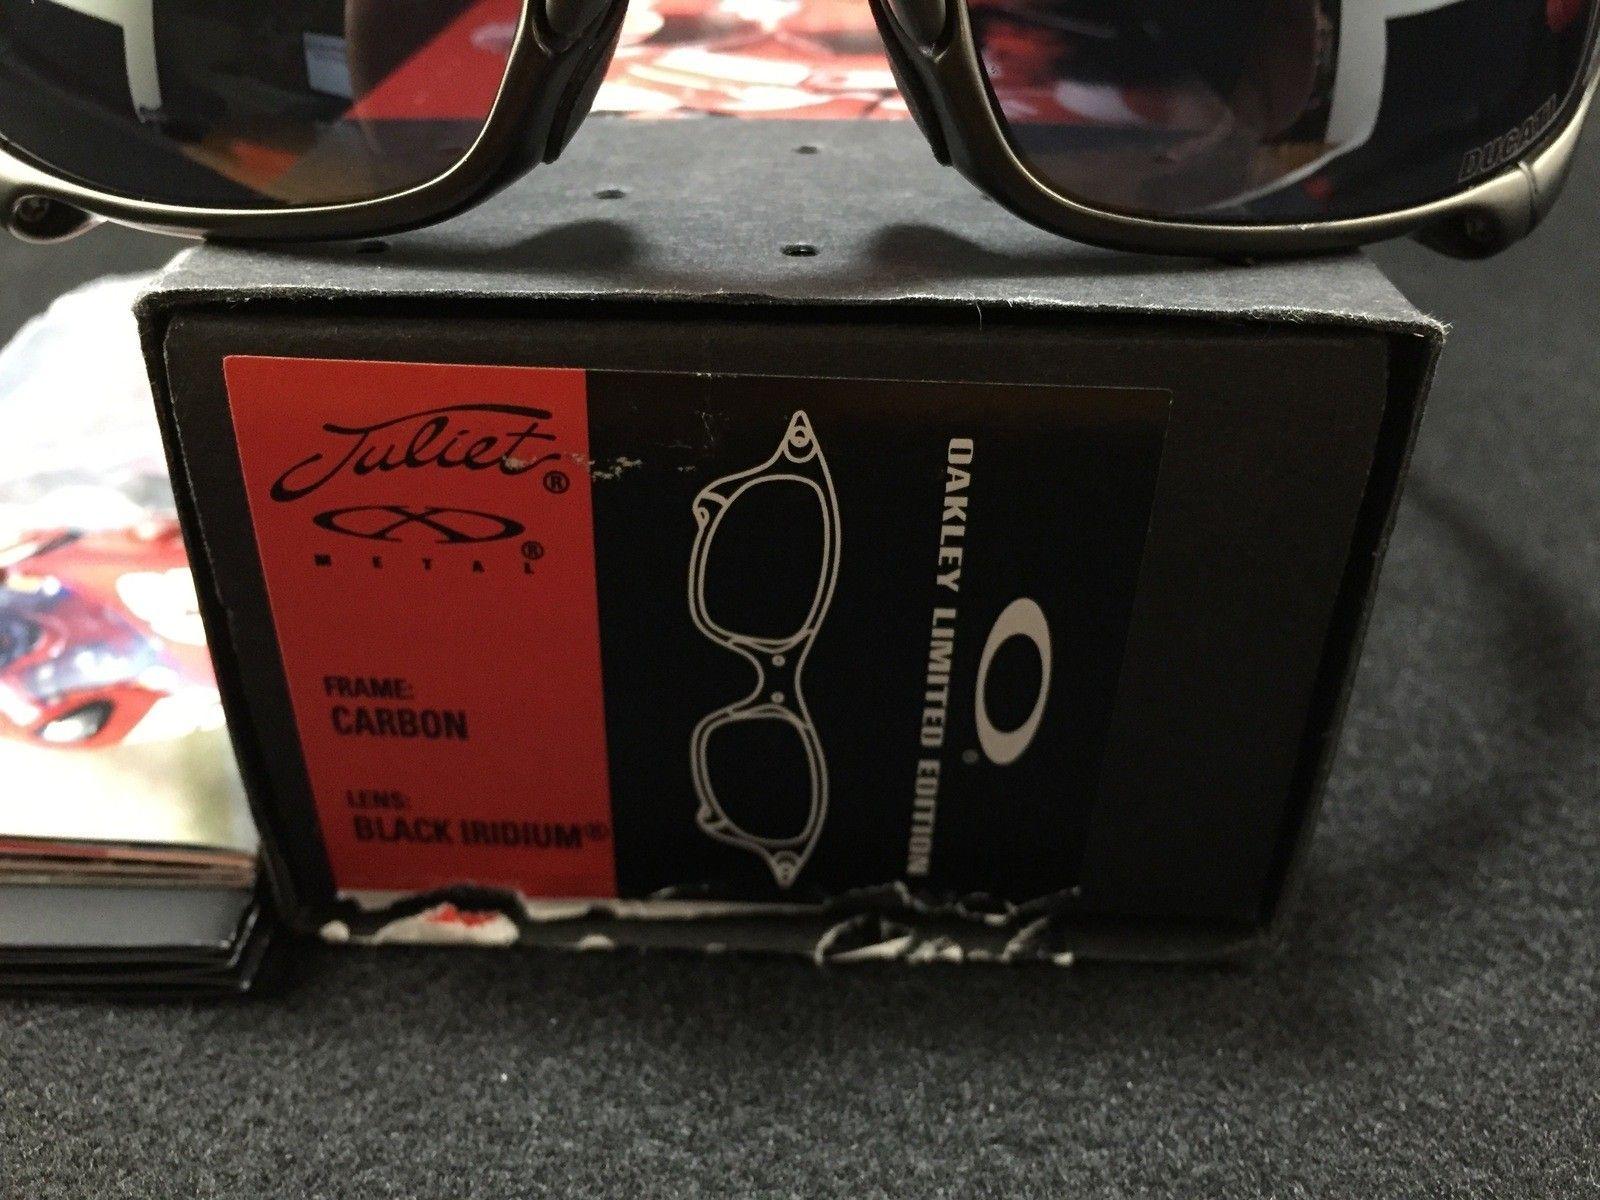 Ducati Juliet Carbon w/ SKU w/ box, coin, papers etc.... - IMG_2828.jpg